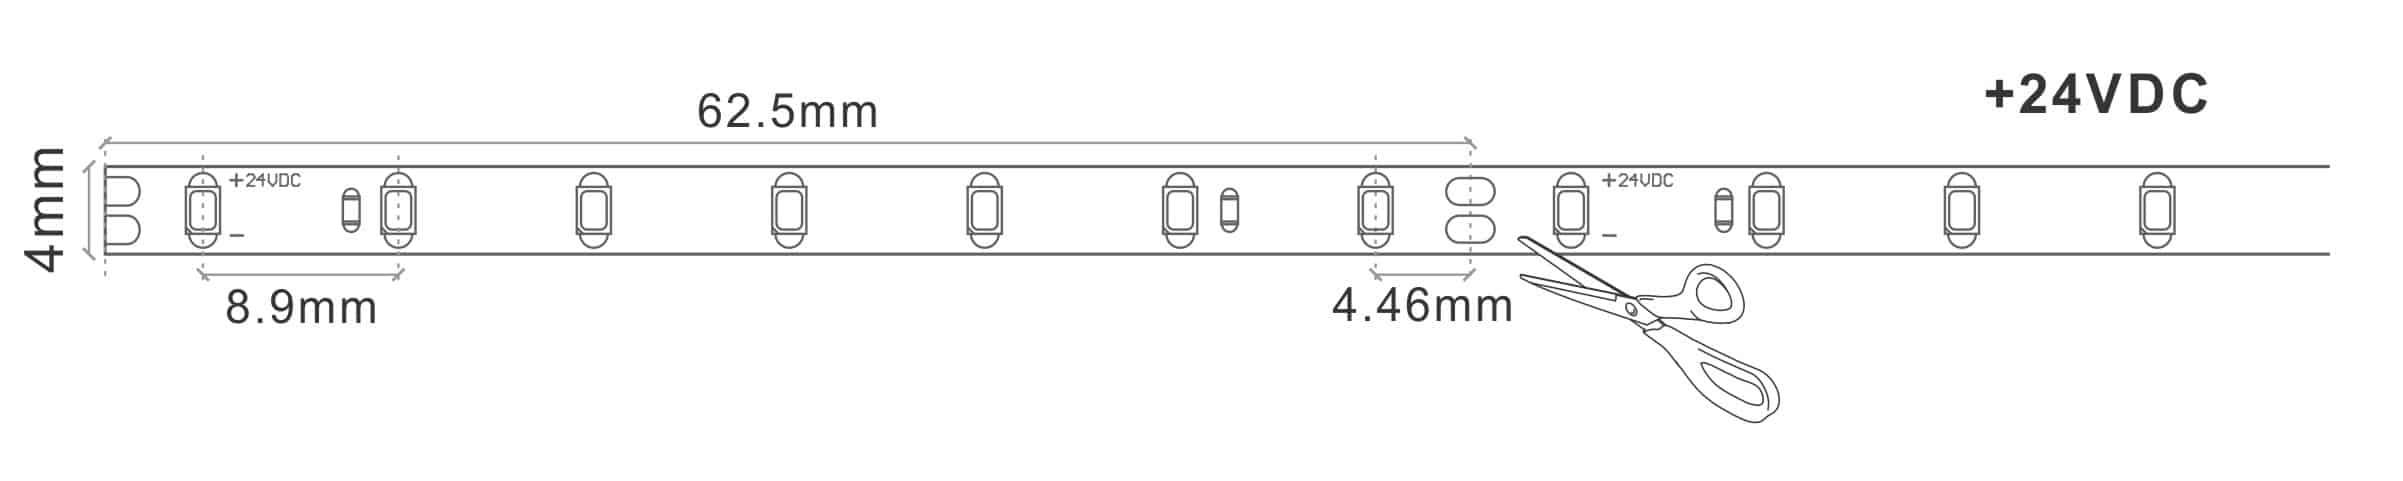 Super Slim 4MM LED Tape Strip Light